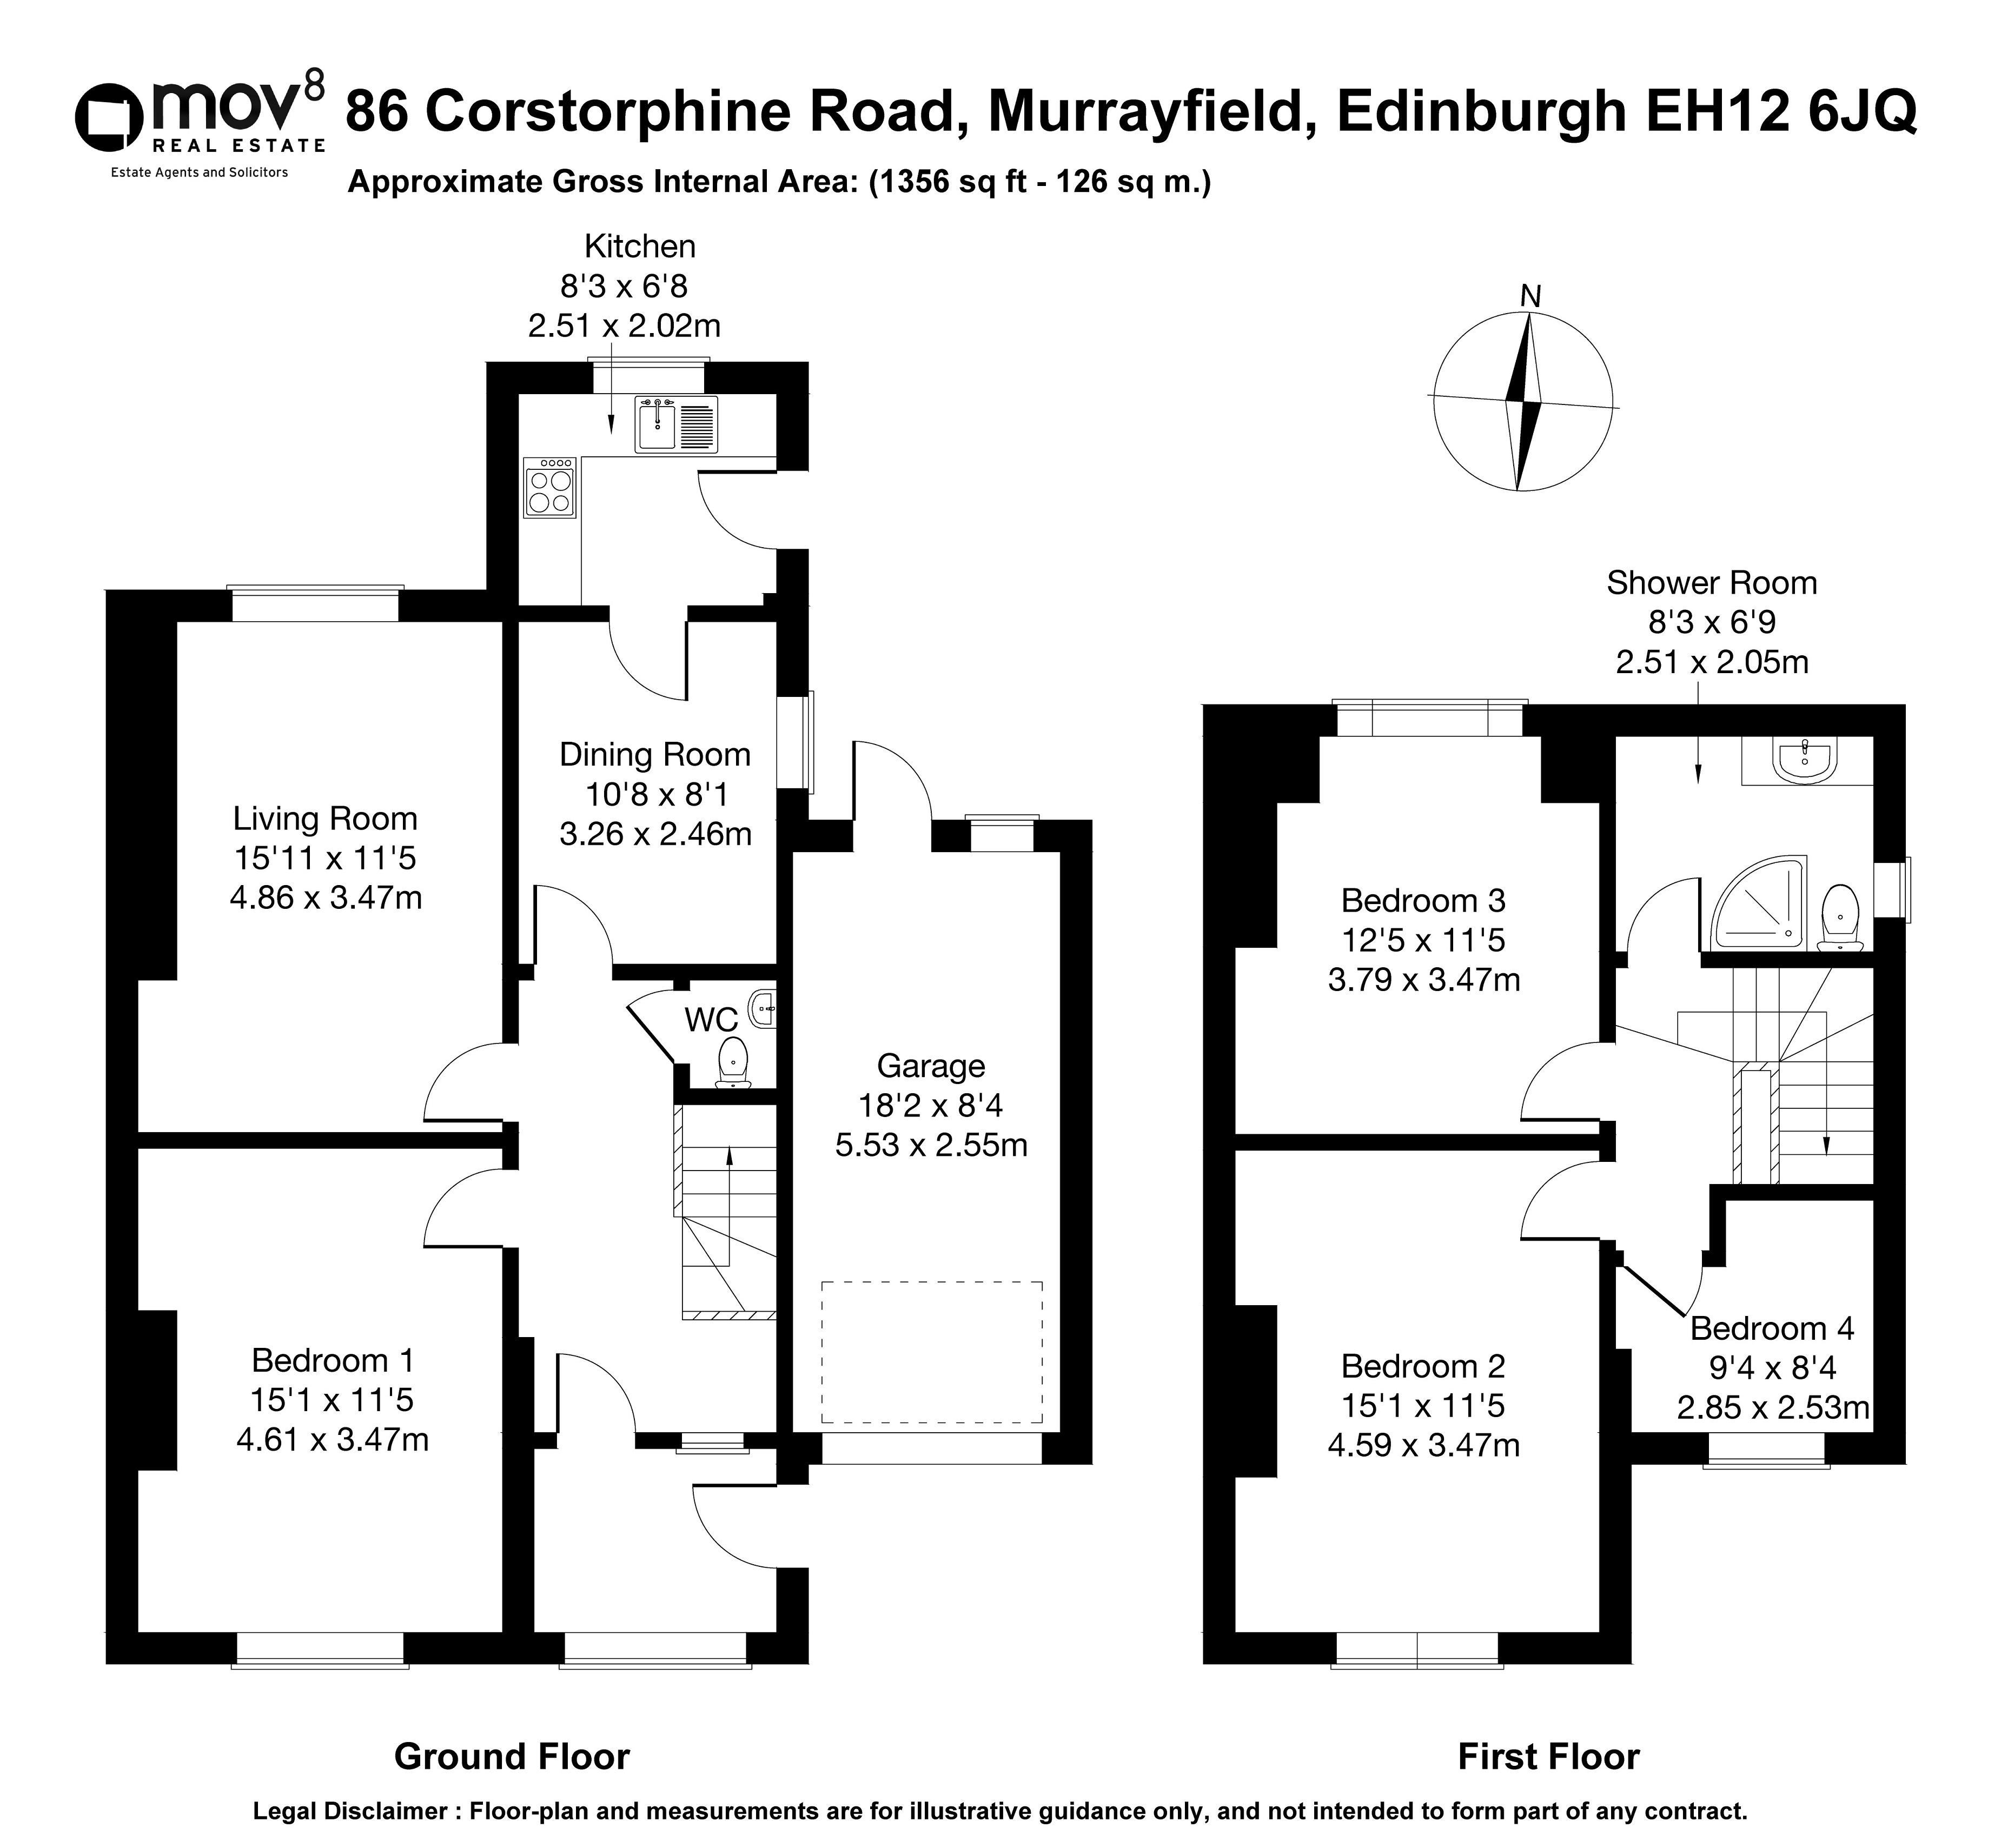 Floorplan 1 of 86 Corstorphine Road, Murrayfield, Edinburgh, EH12 6JQ